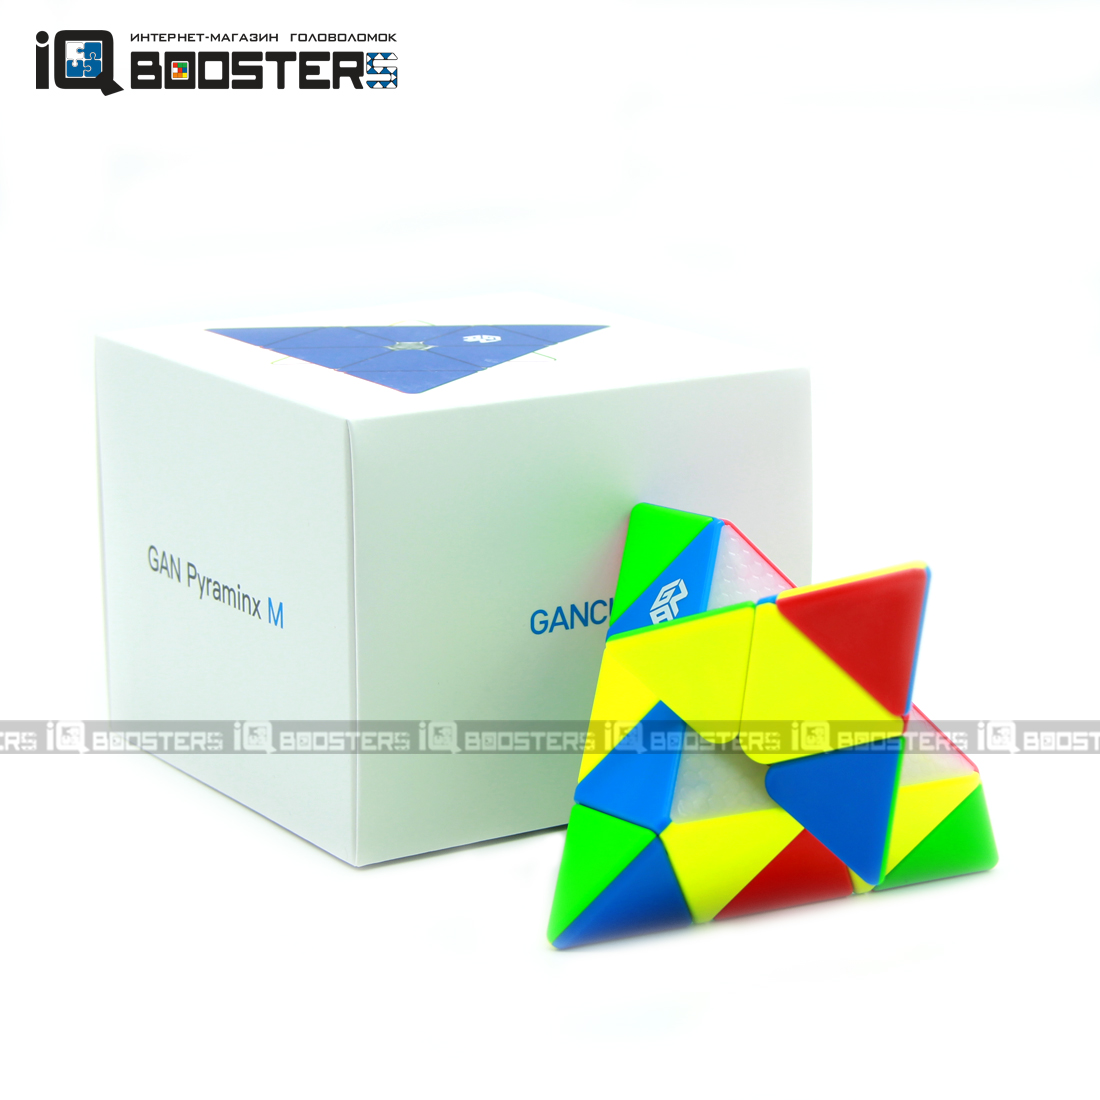 gan_pyraminx_enhance_10